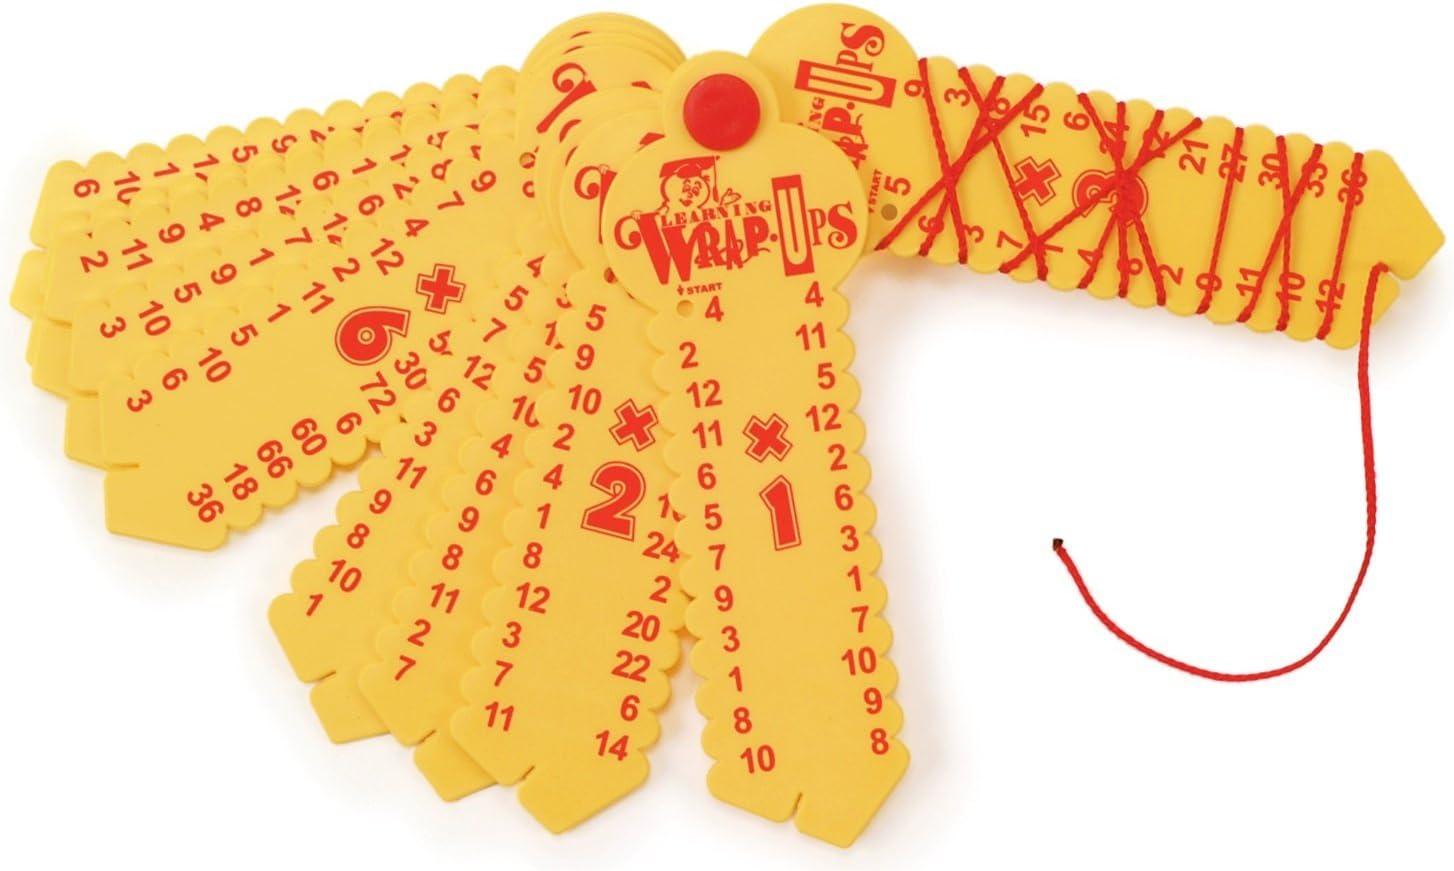 B0007P95JA Learning Wrap-ups Multiplication Self Correcting Math Problem Keys 71ZUoIzouvL